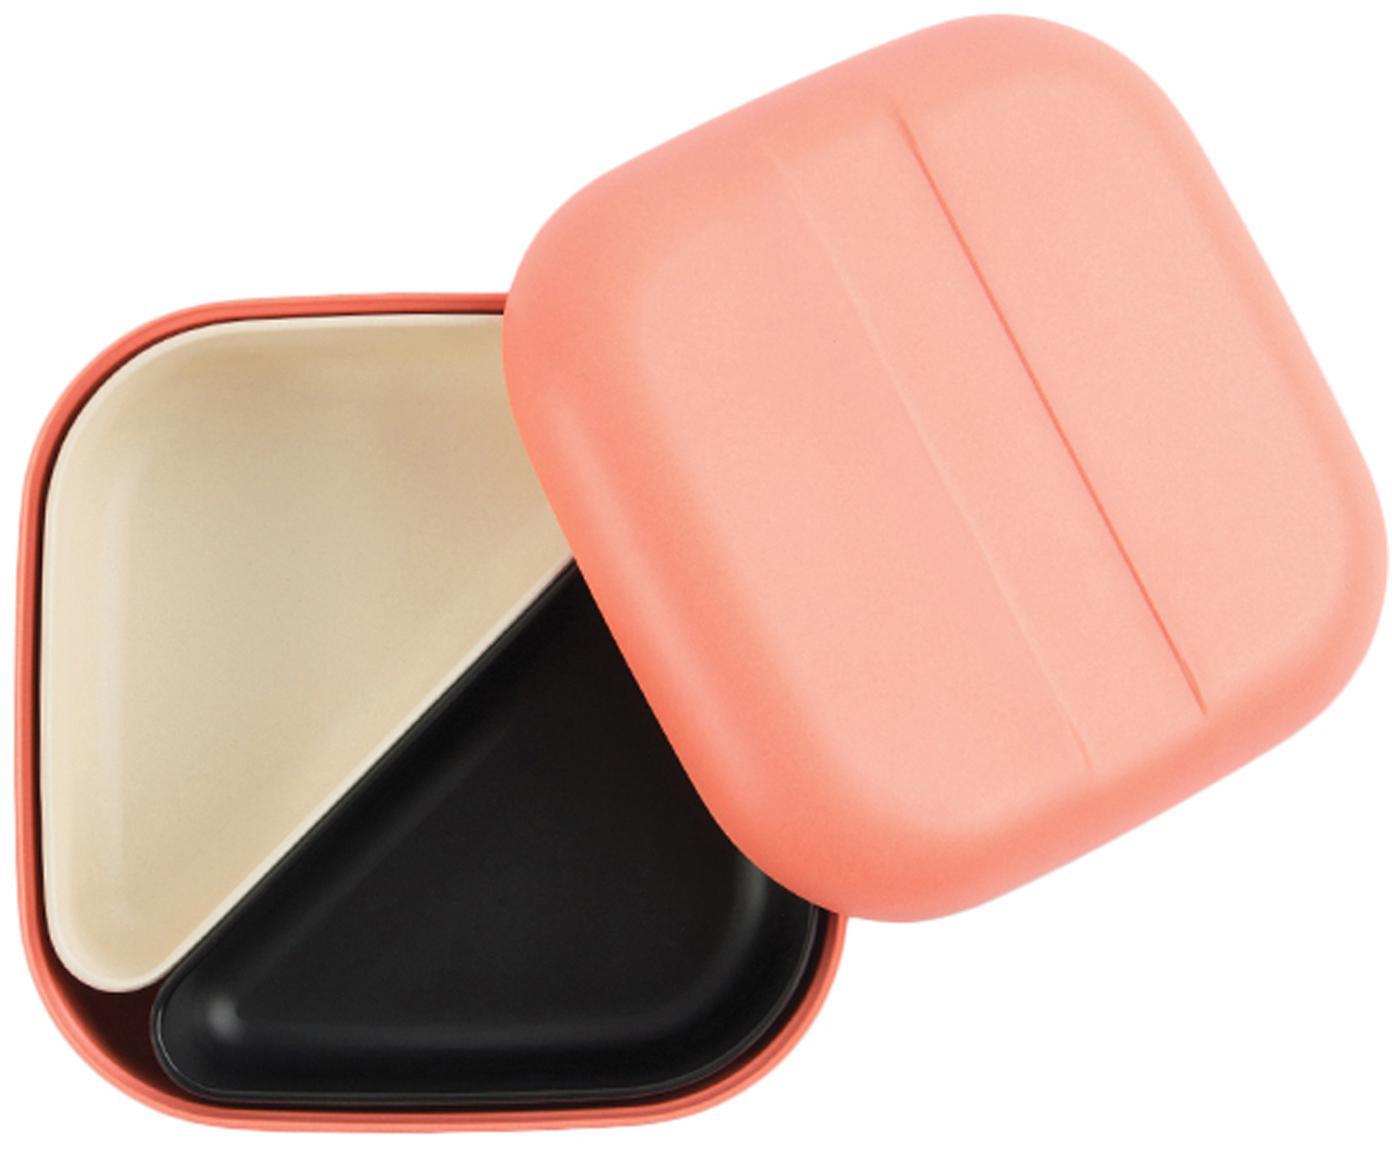 Lunchbox Bento, Bamboehoutvezels, melamine, voedselveilig BPA-, PVC- en ftalatenvrij, Koraalrood, crèmewit, zwart, 15 x 7 cm